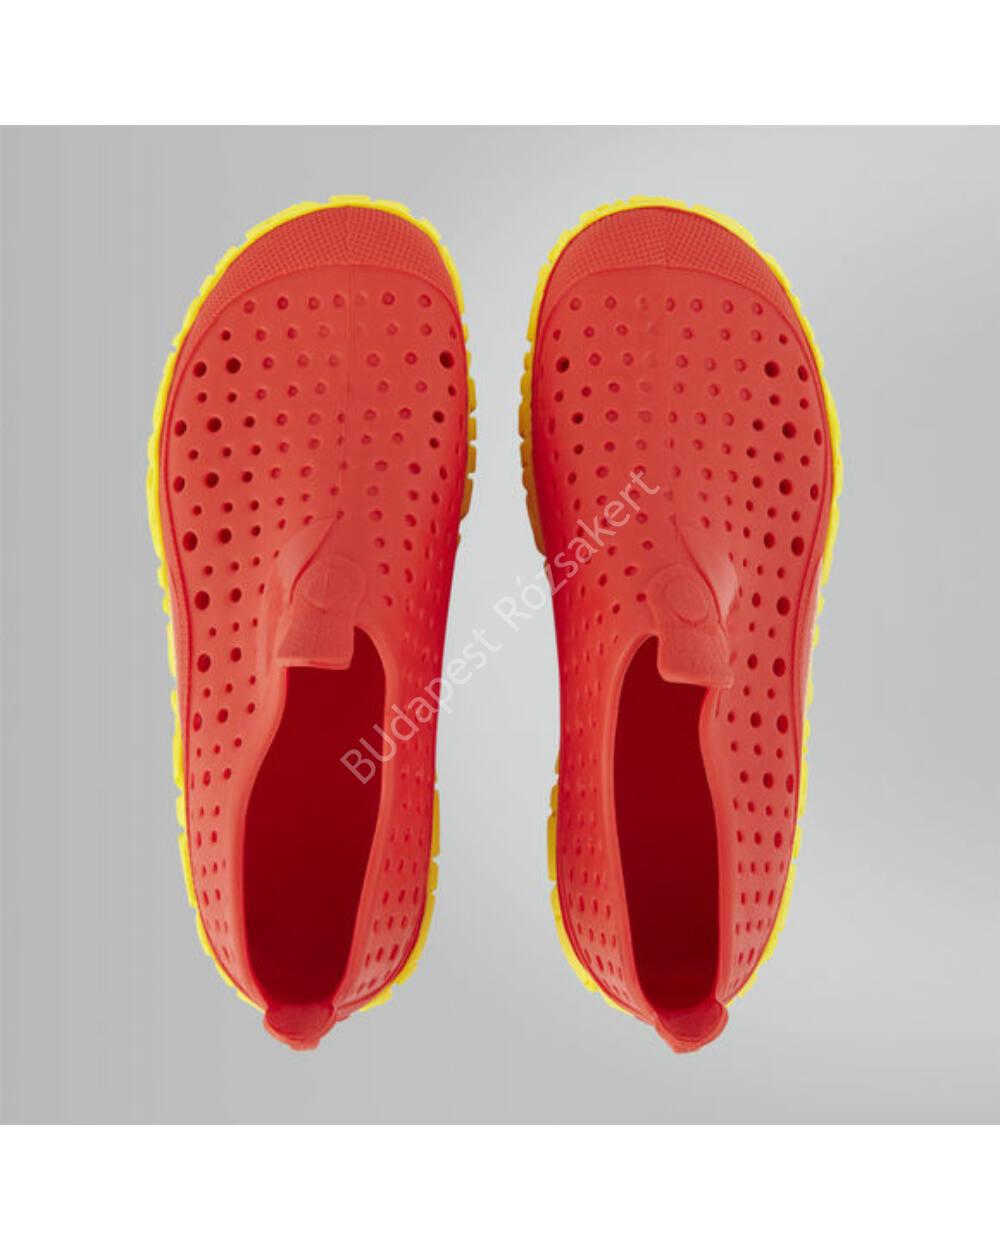 Speedo Jelly Junior gyerek vizicipő piros-sárga 32